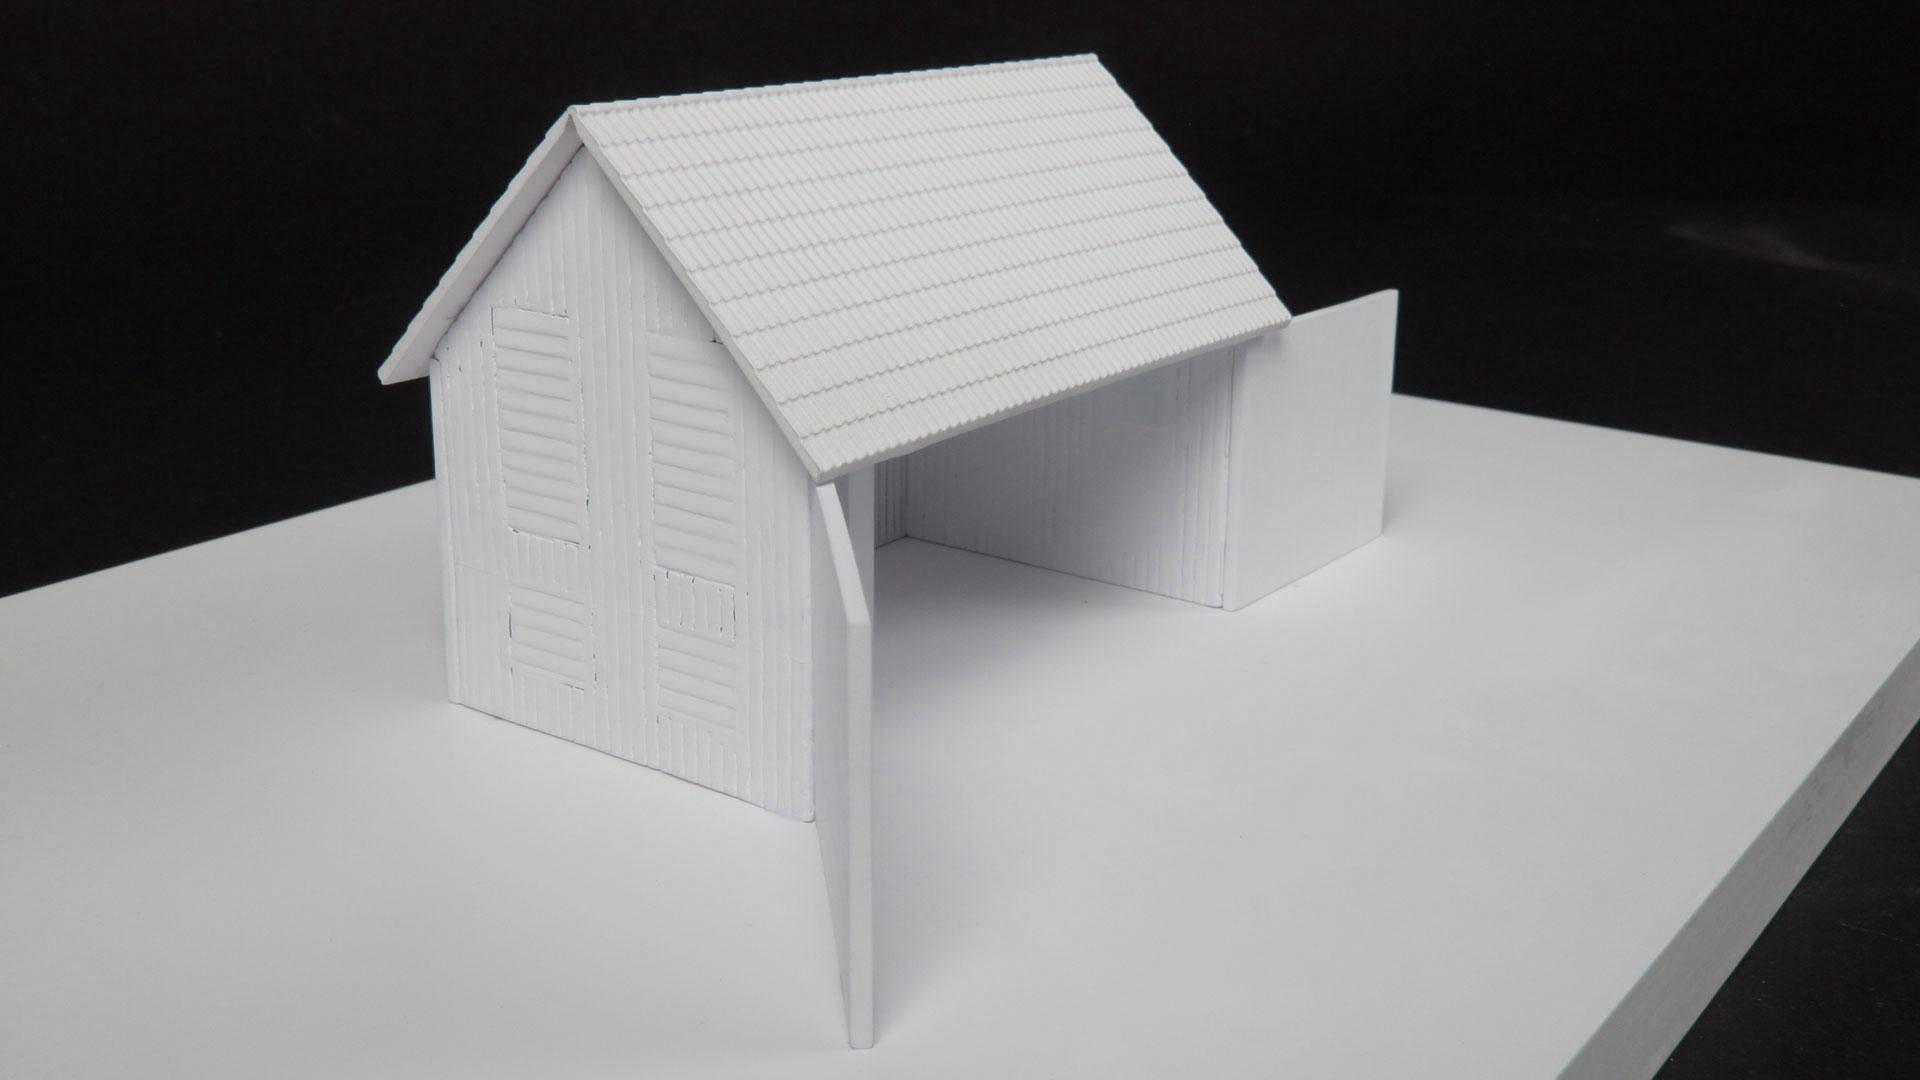 3d architekturmodelle schlagheck design for Architektur 3d druck